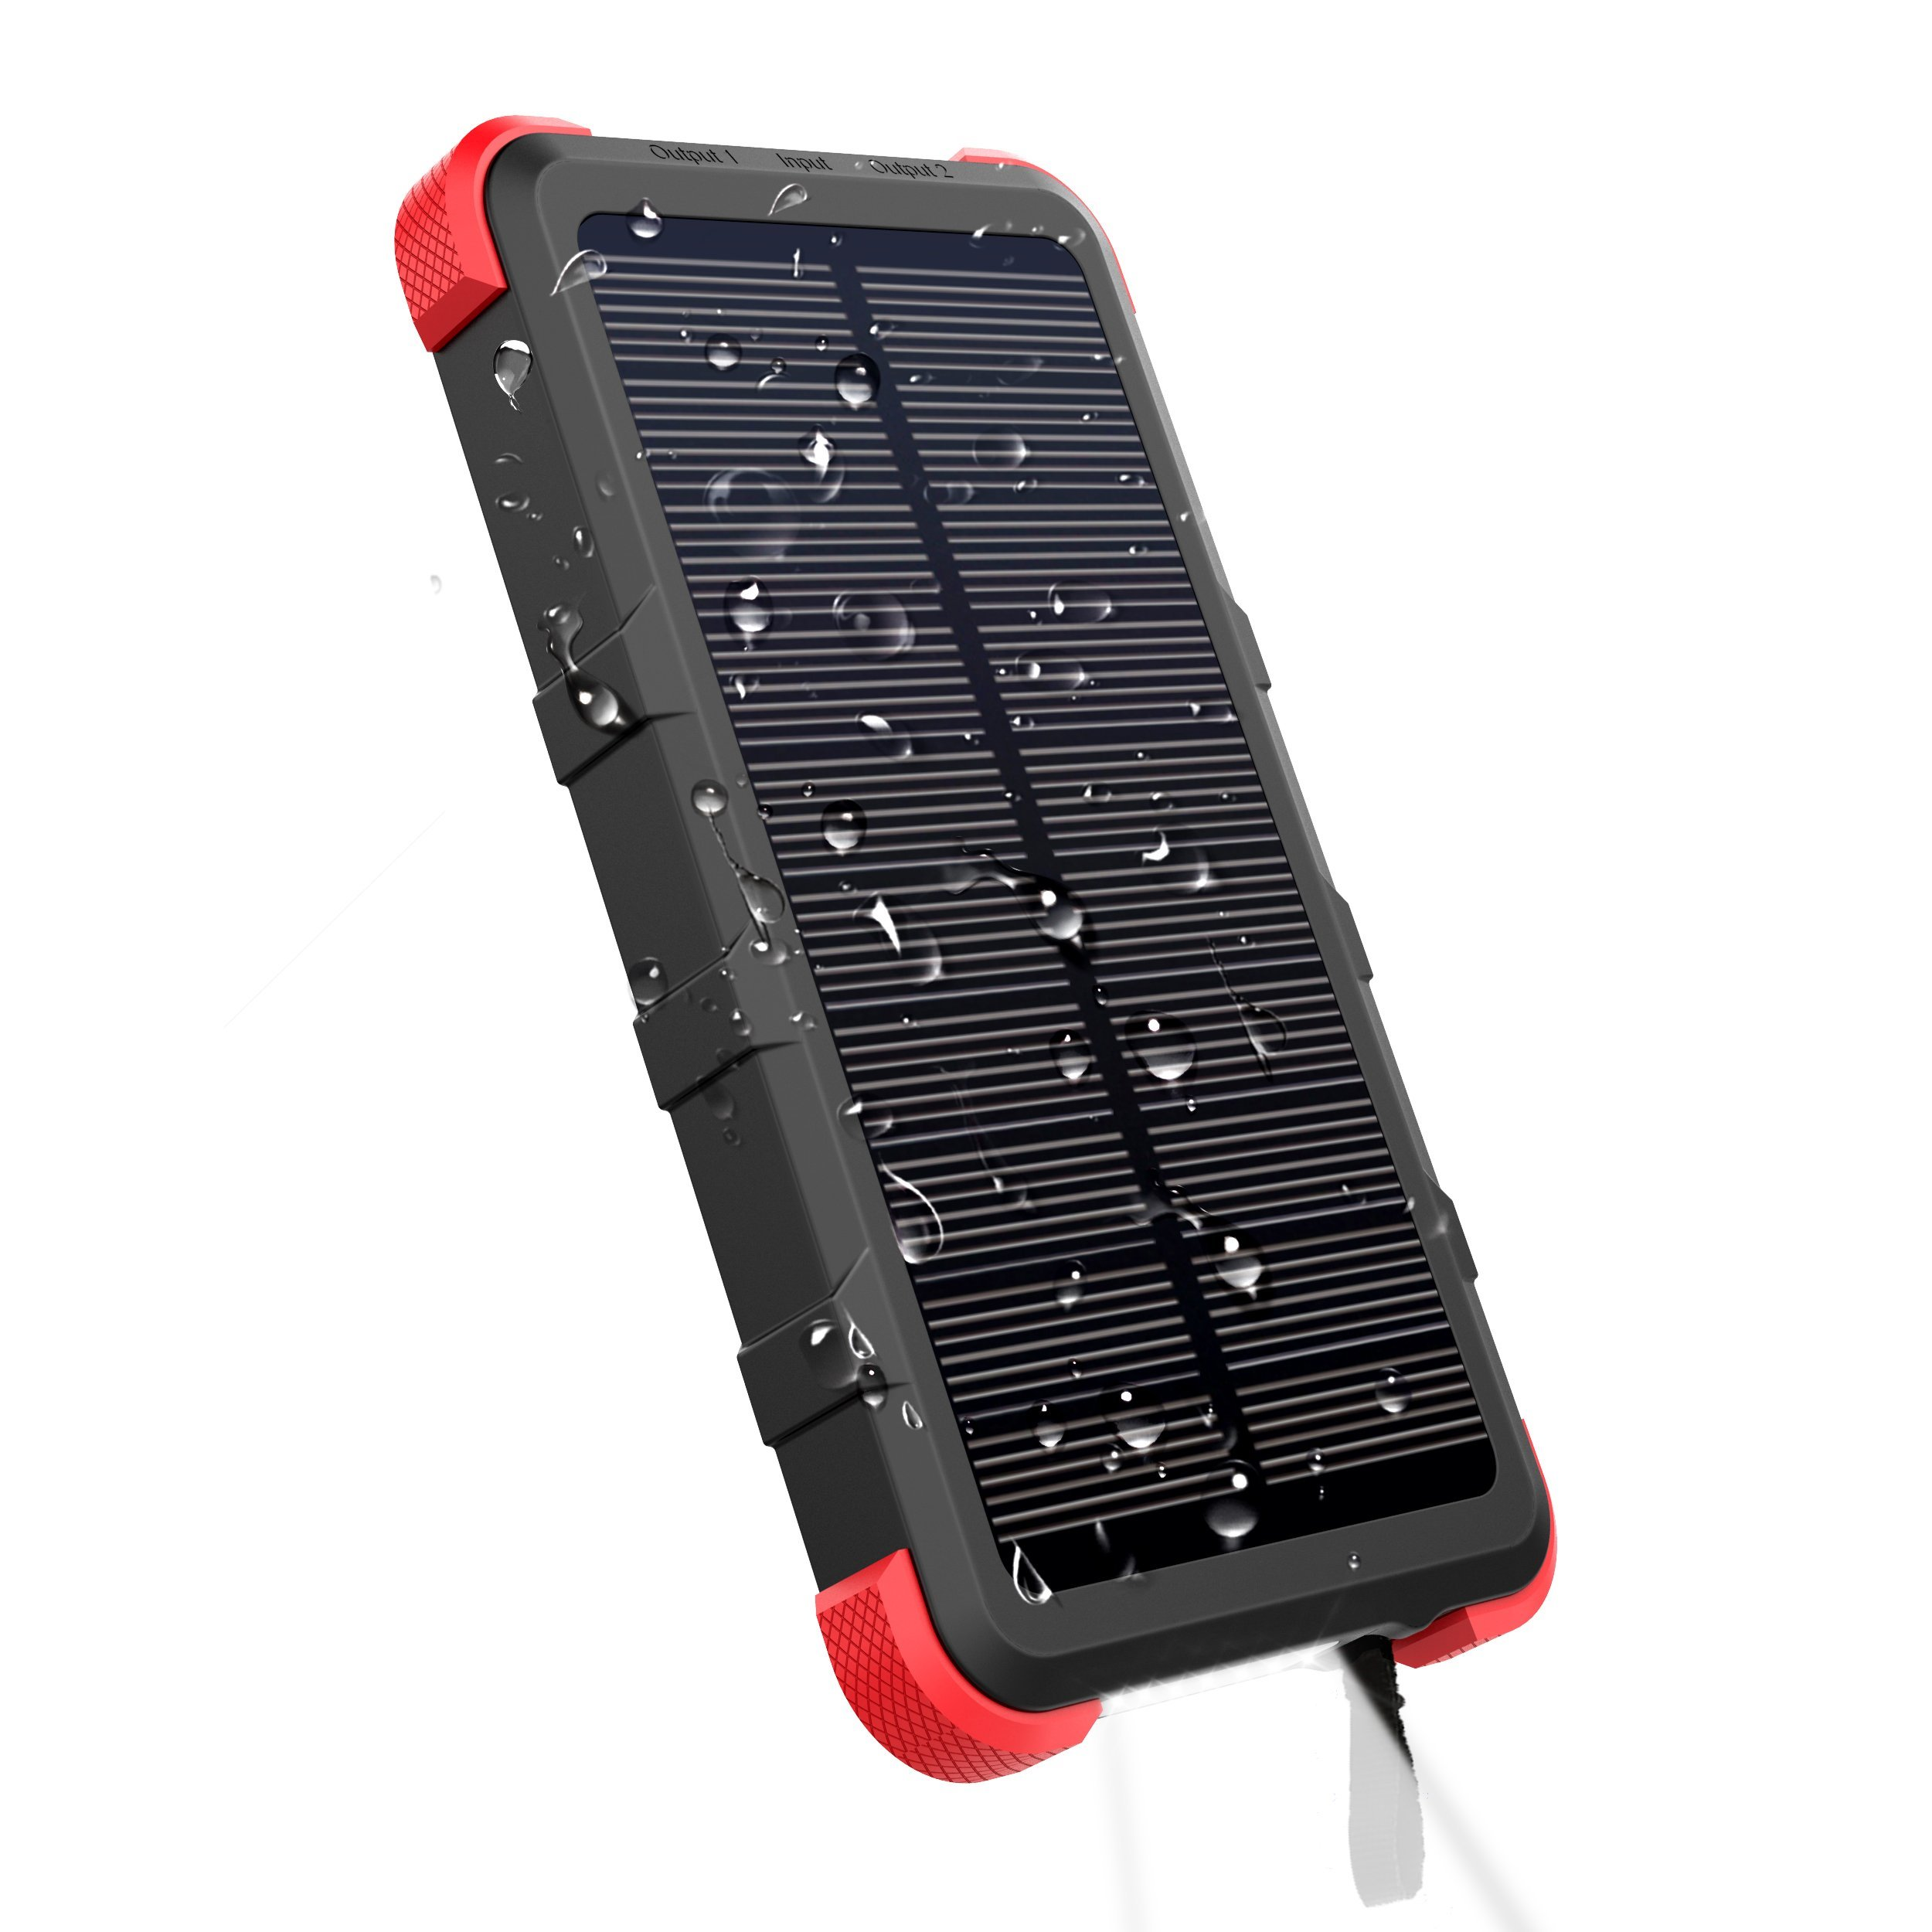 Solární powerbanka OUTXE PCB20000WS Savage QuickCharge 20000mAh